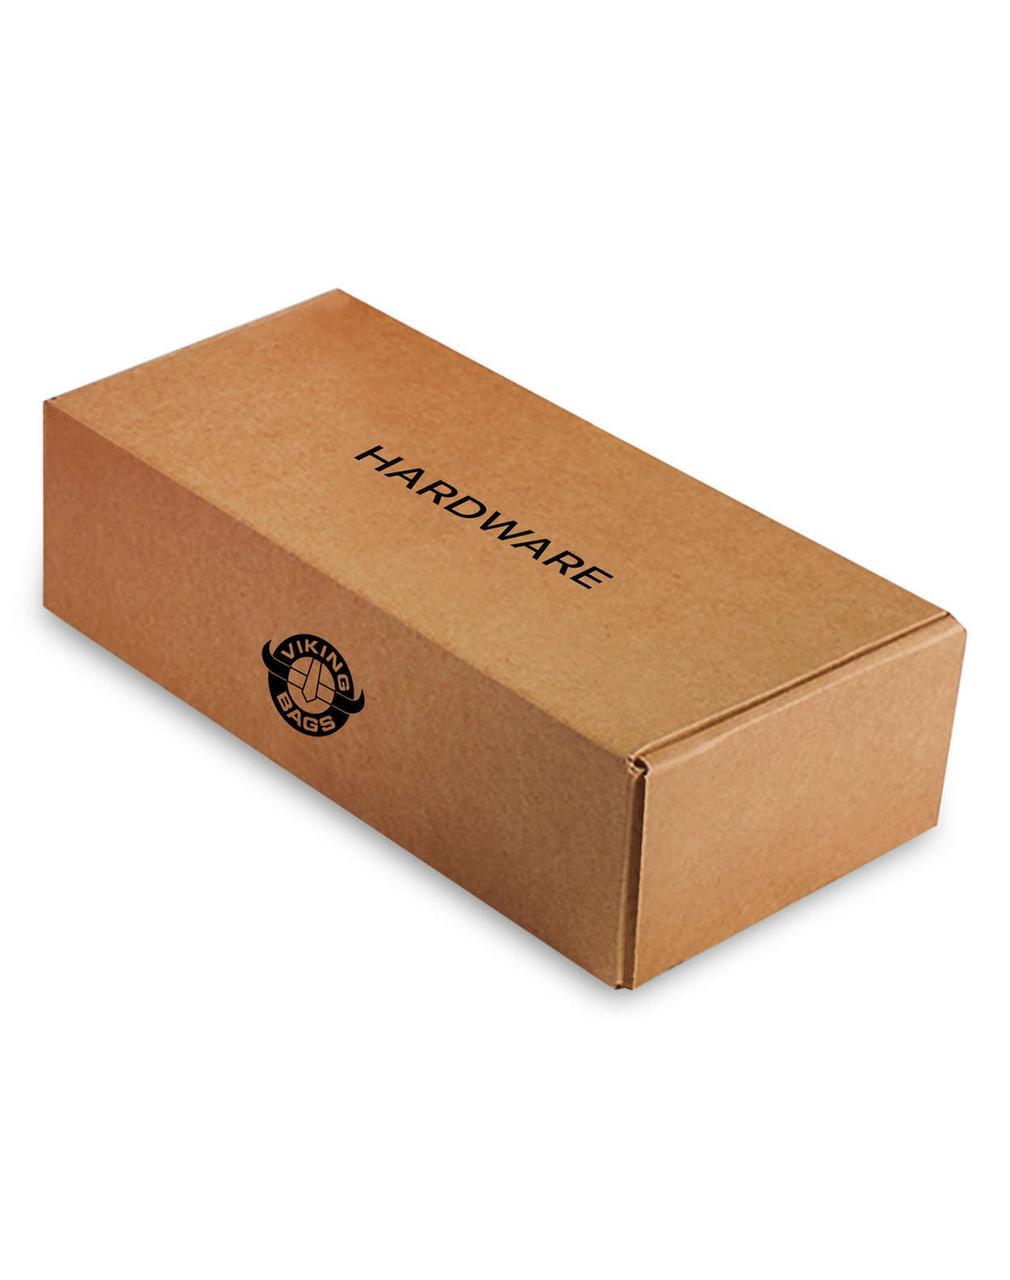 Indian Scout Sixty Charger Slanted Medium Motorcycle Saddlebags Hardware Box